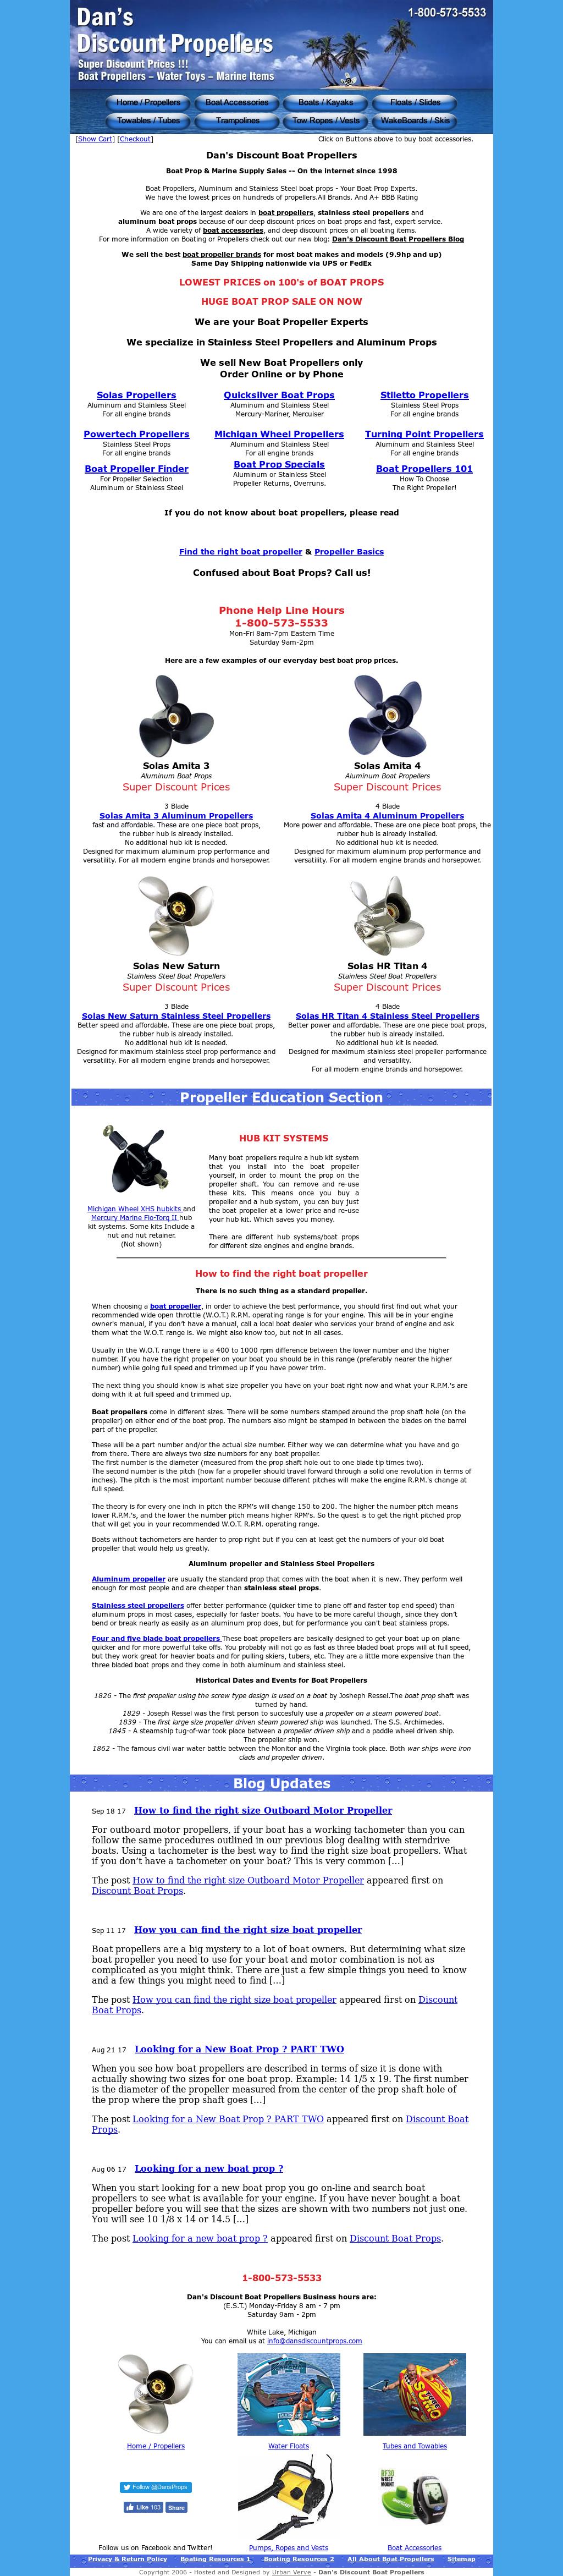 Dan's Discount Boat Propellers Competitors, Revenue and